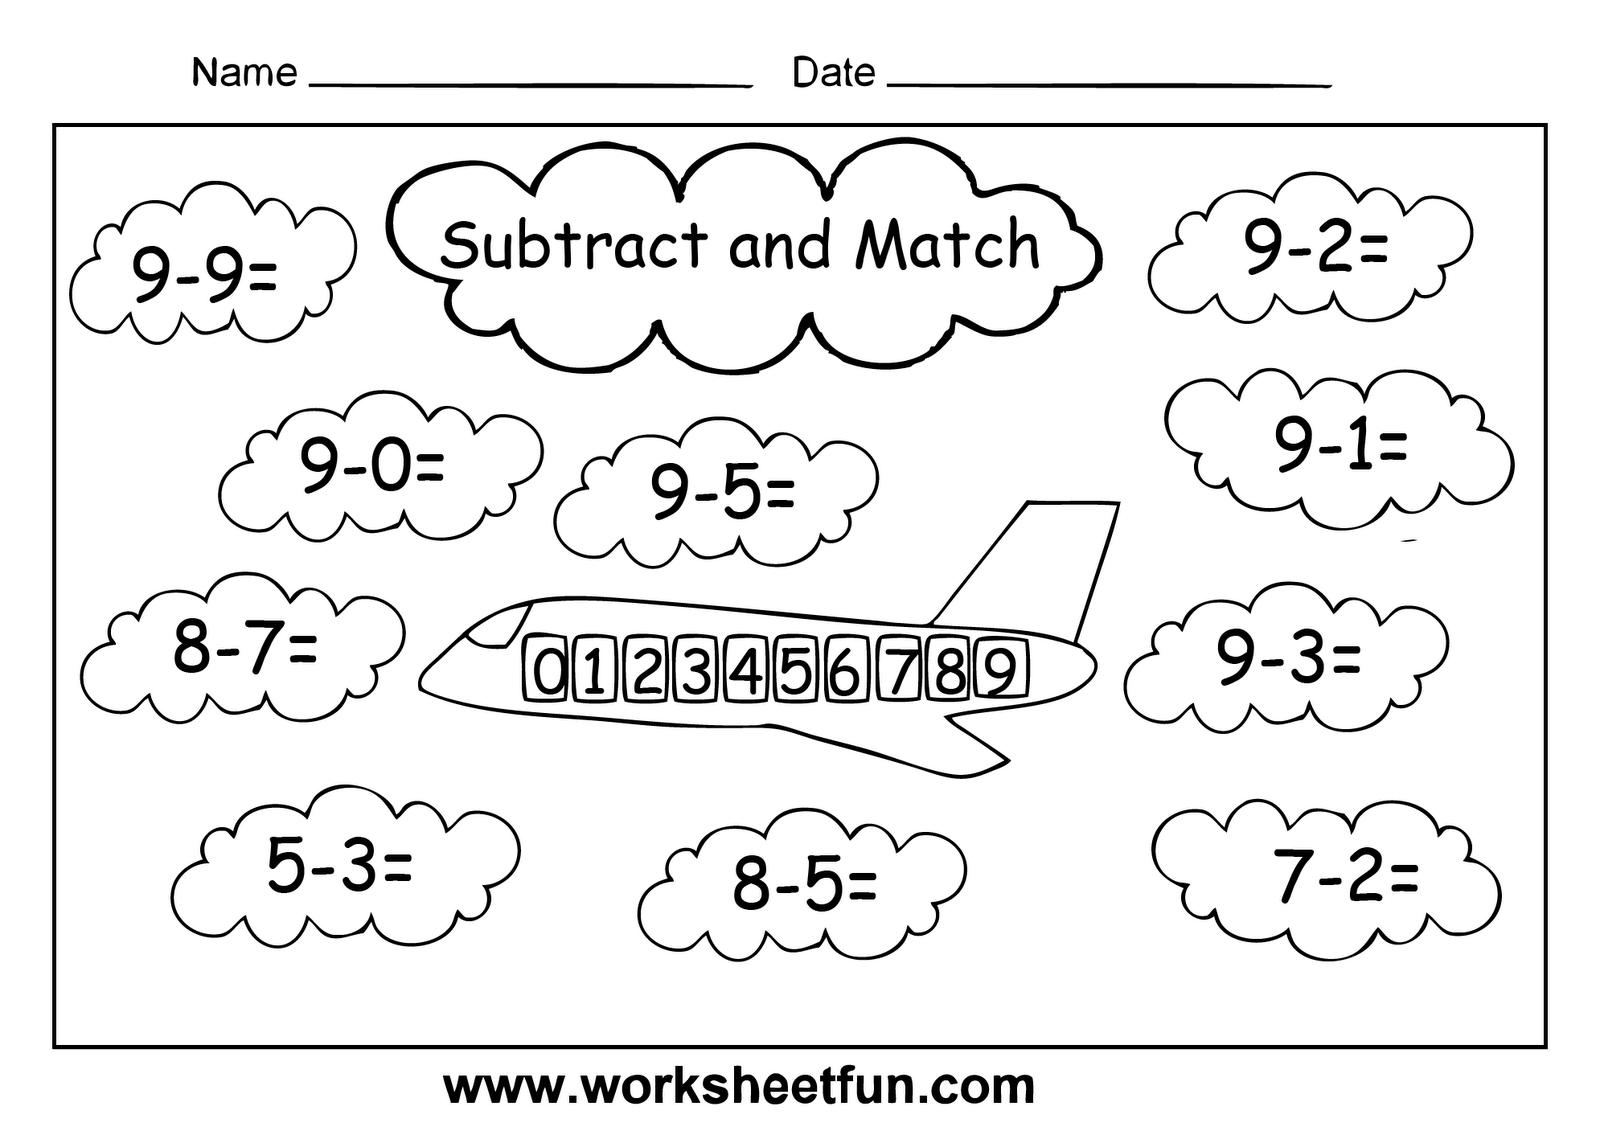 hight resolution of Worksheetfun - FREE PRINTABLE WORKSHEETS   1st grade math worksheets